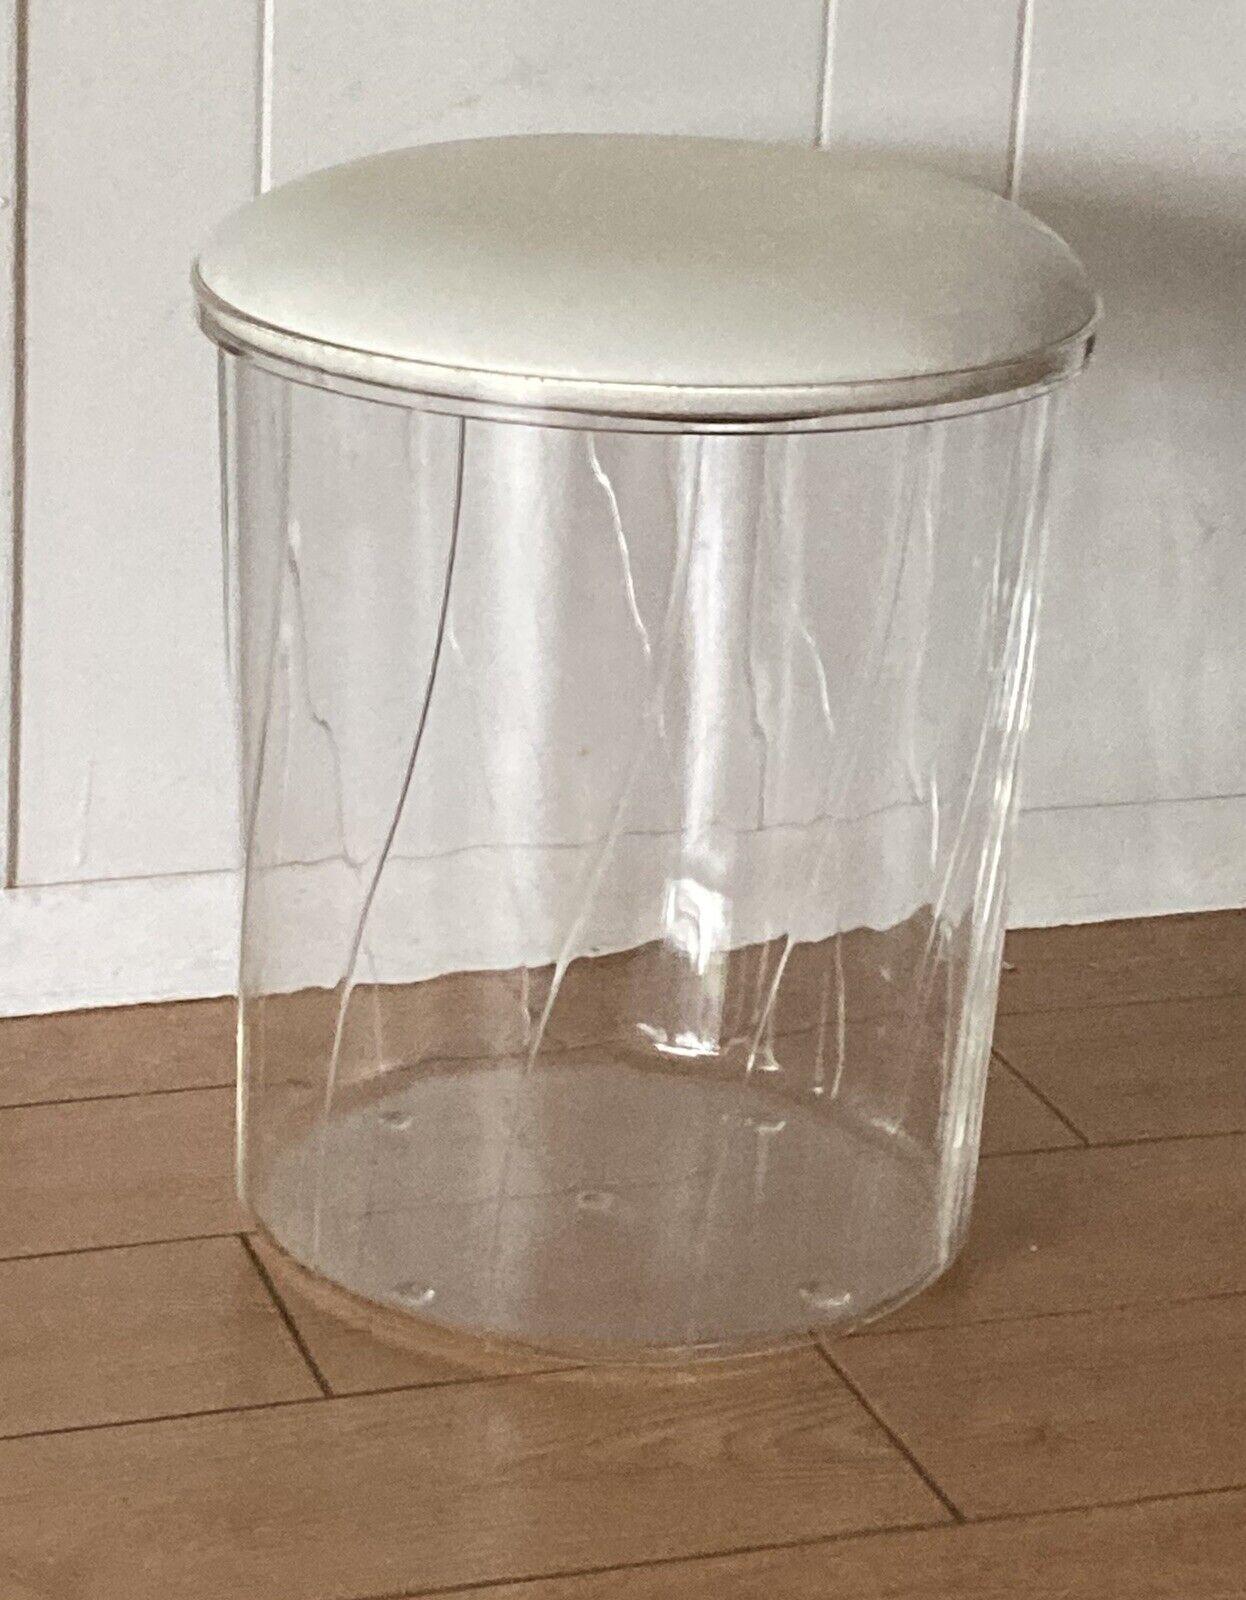 Orren Ellis Damore Ellipse Acrylic Vanity Stool For Sale Online Ebay